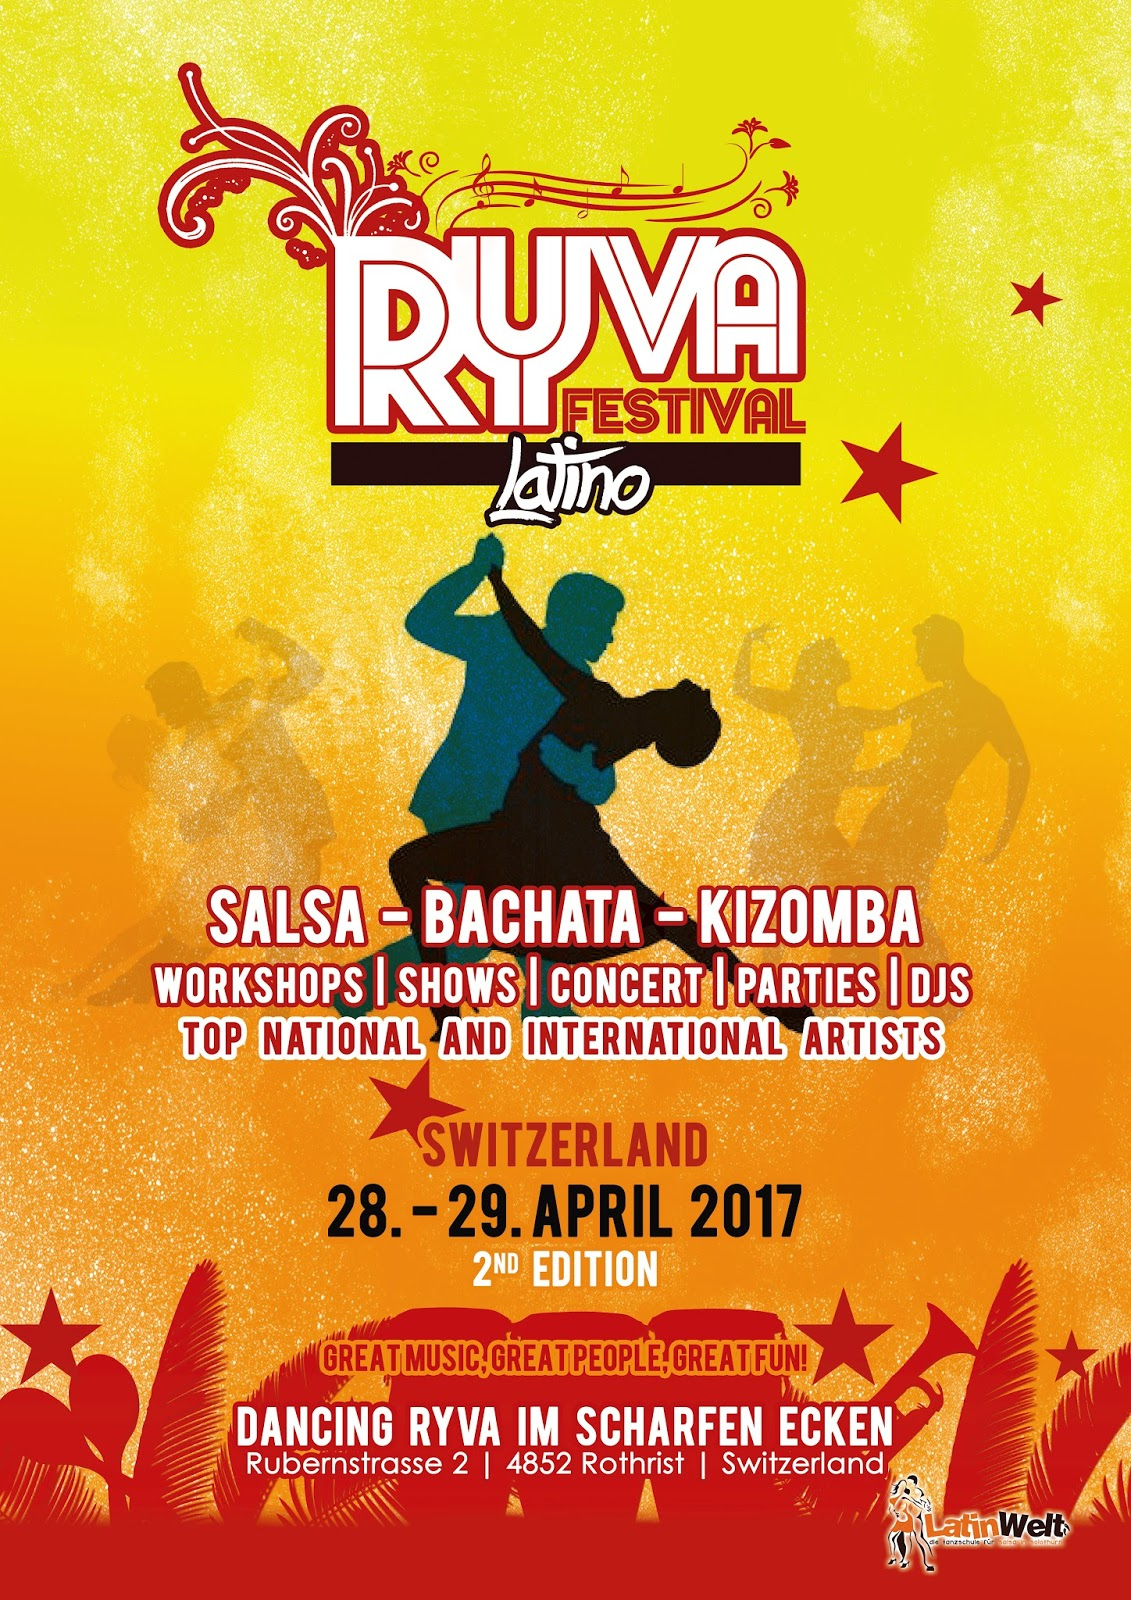 RYVA FESTIVAL LATINO SWITZERLAND APRIL 2017